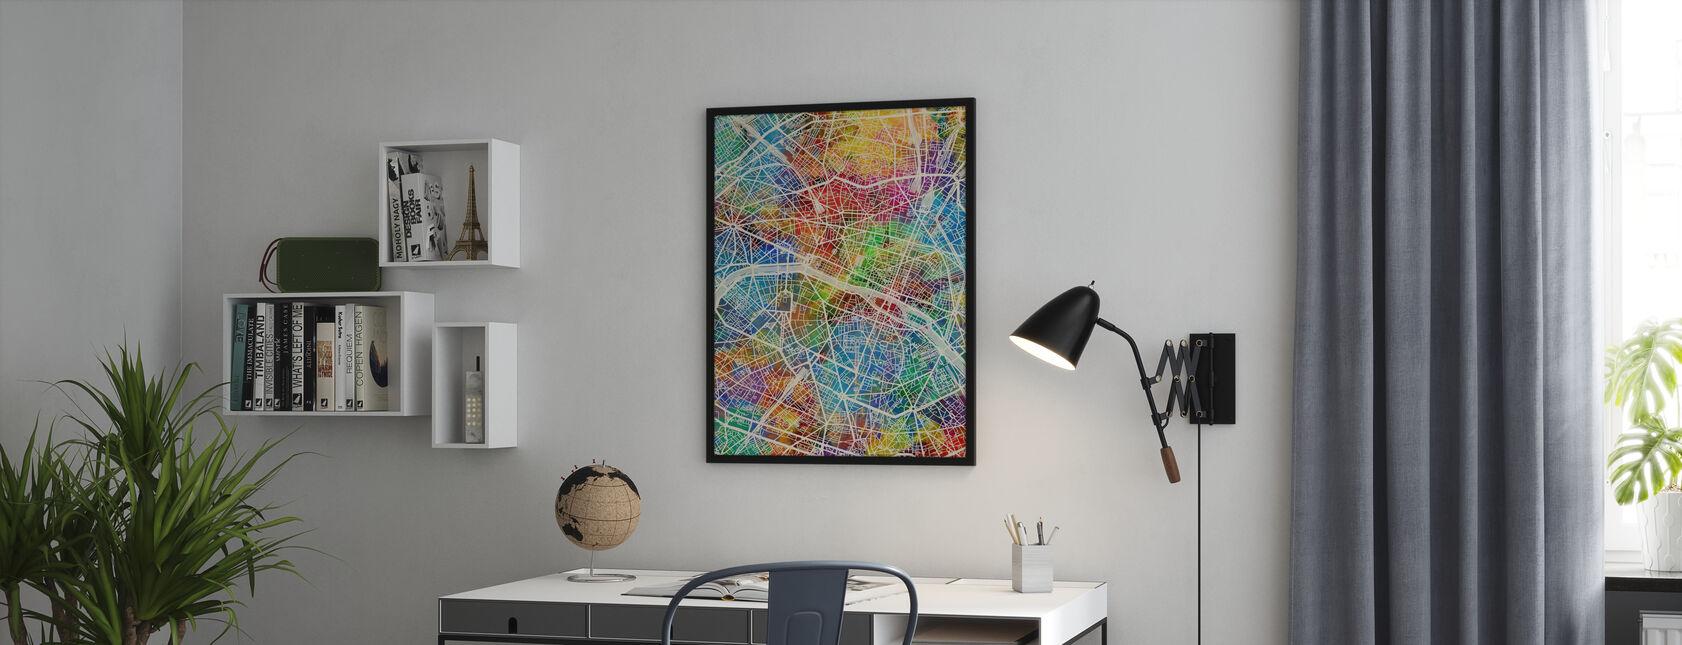 Paris France City Map - Poster - Office